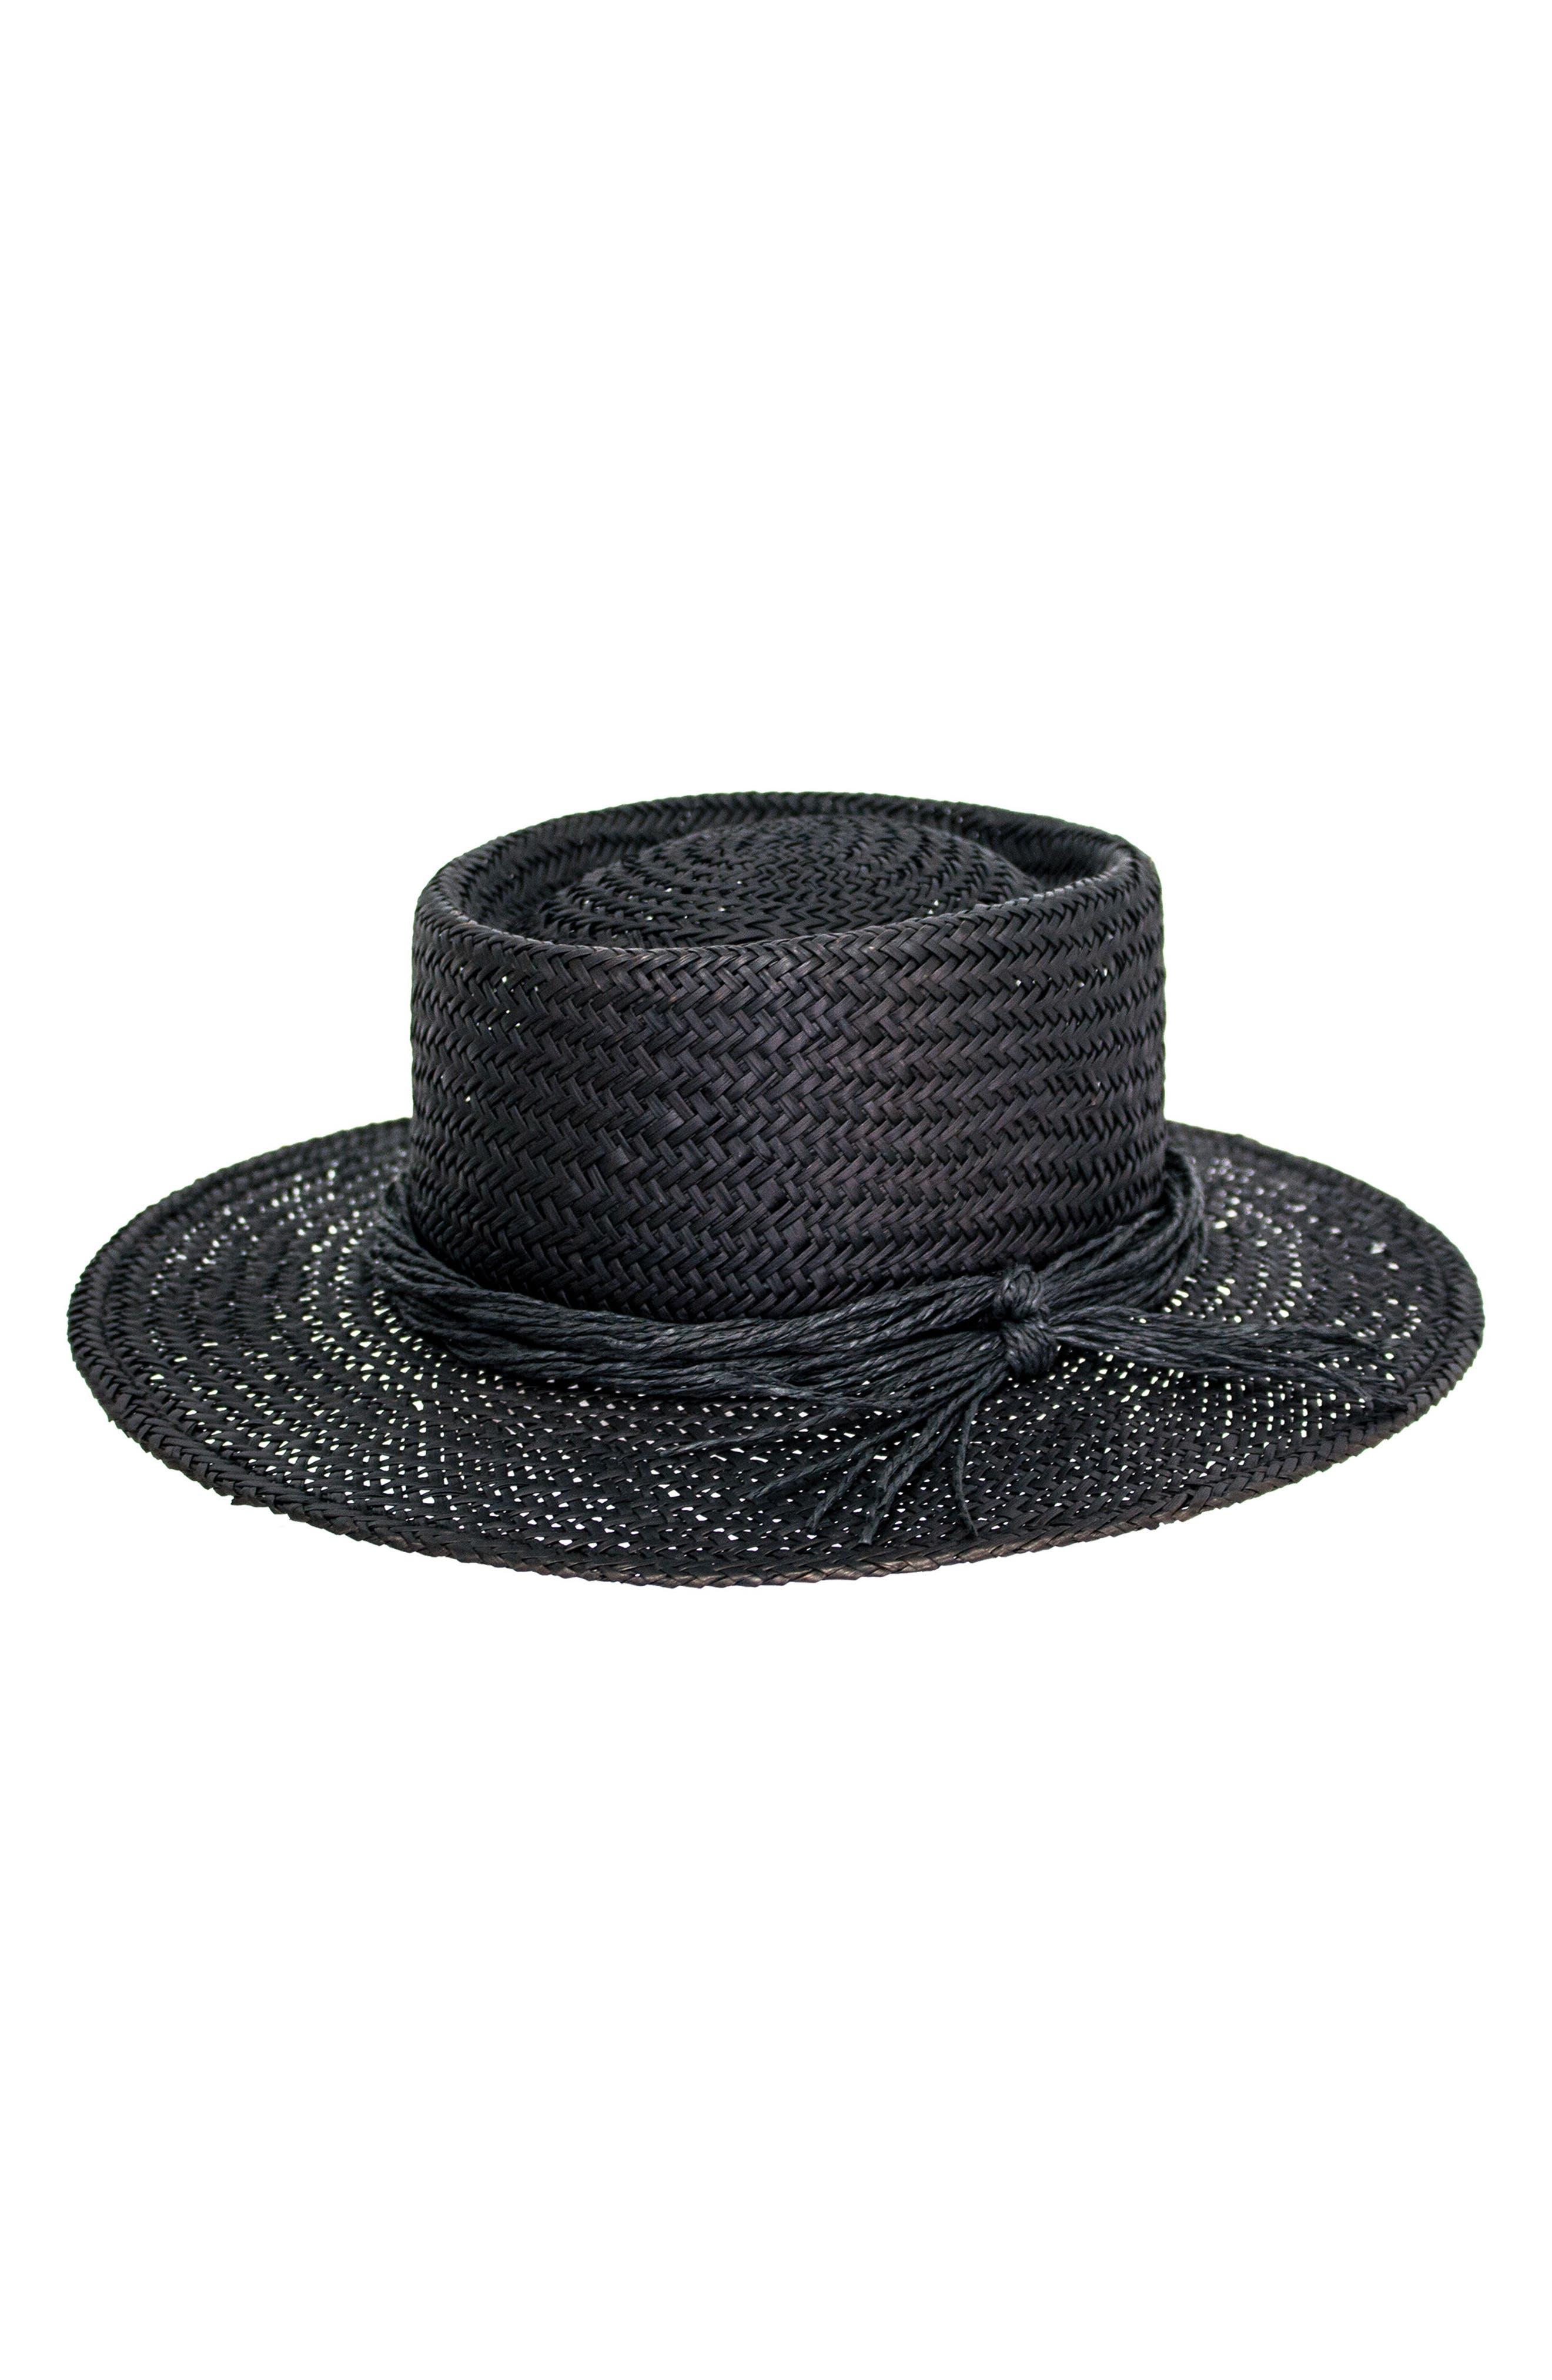 Borden Straw Resort Hat,                         Main,                         color, 001